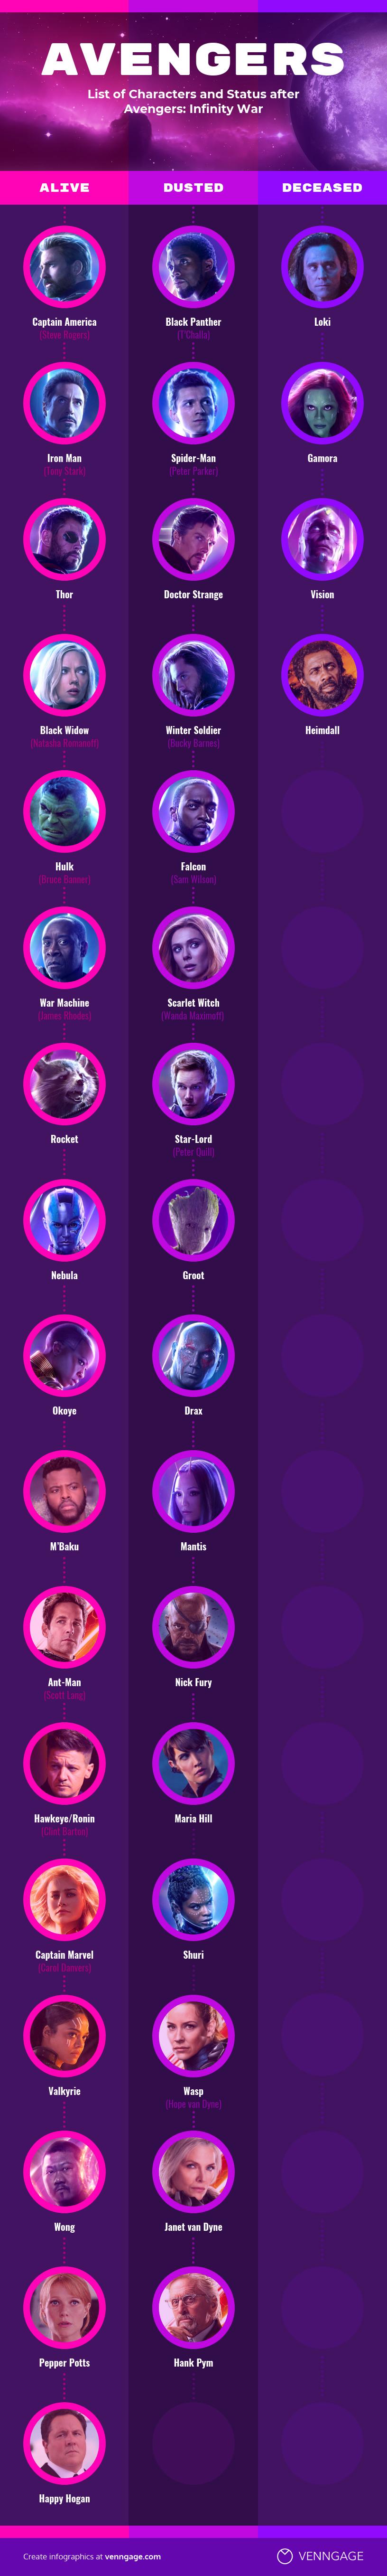 Avengers Endgame Infographic Character Status Venngage